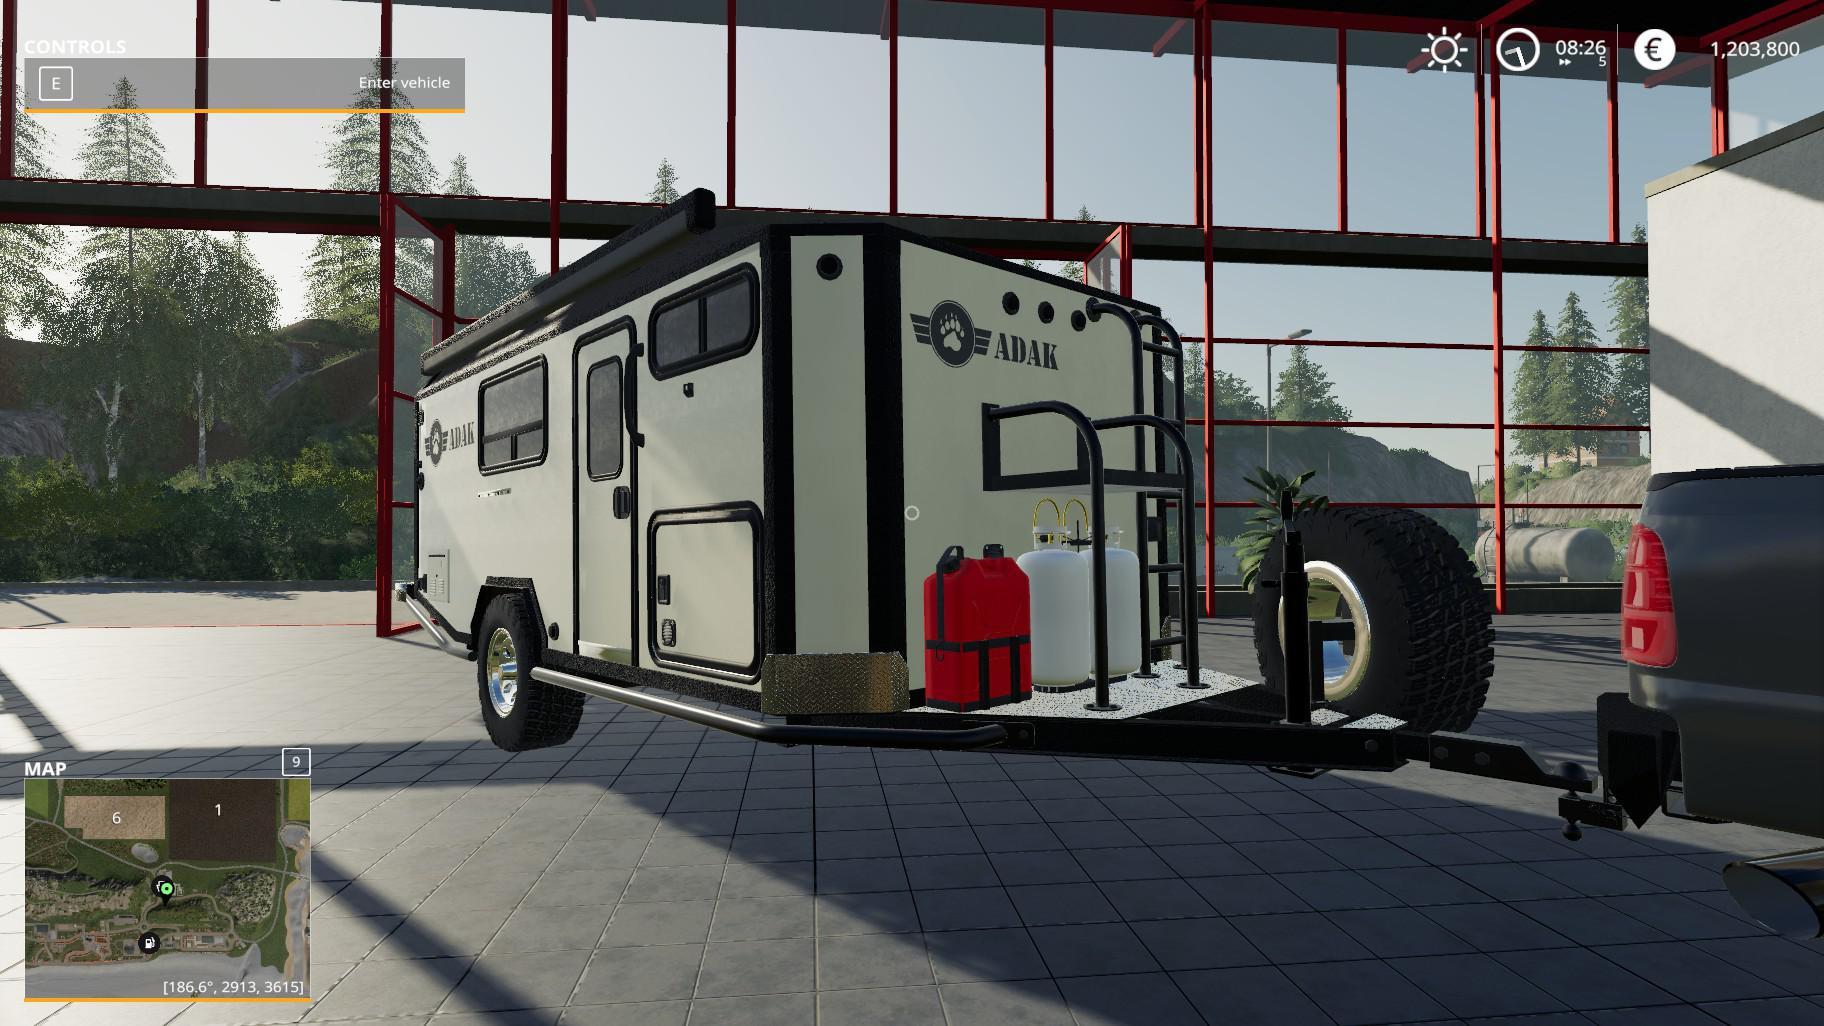 Adak Off Road Camper v1 0 FS19 - Farming Simulator 19 Mod